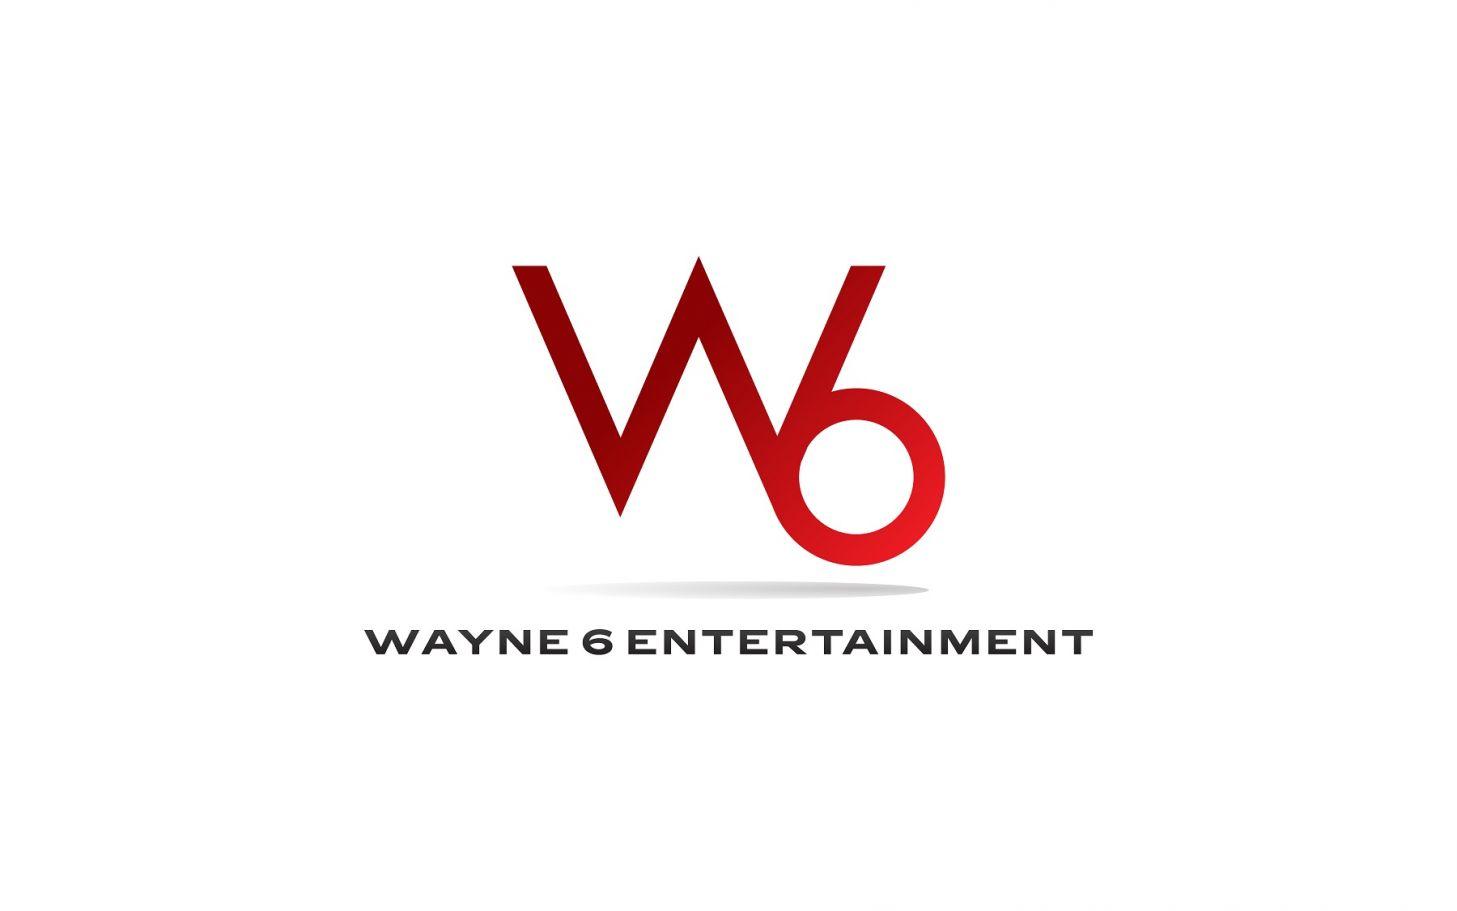 Wayne 6 Entertainment Logo